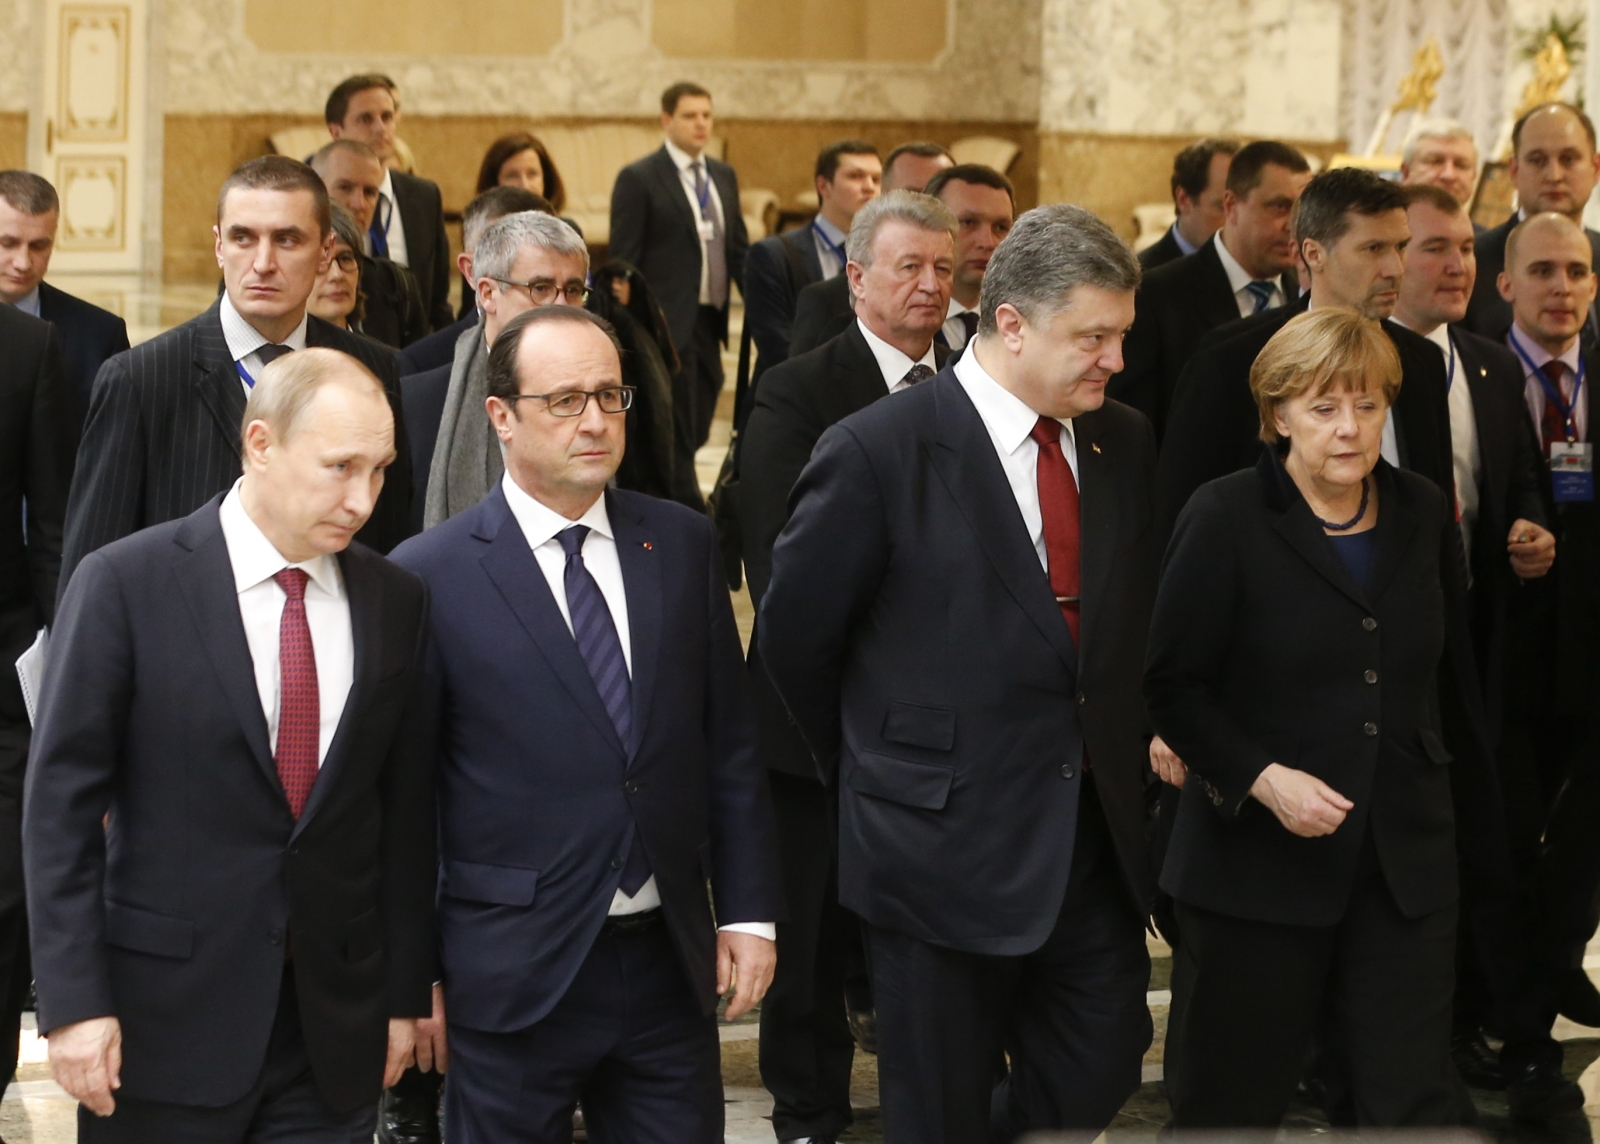 Russia's President Vladimir Putin (L, front), Ukraine's President Petro Poroshenko (2nd R, front), Germany's Chancellor Angela Merkel (R, front) and France's President Francois Hollande (2nd L, front) walk during peace talks in Minsk,